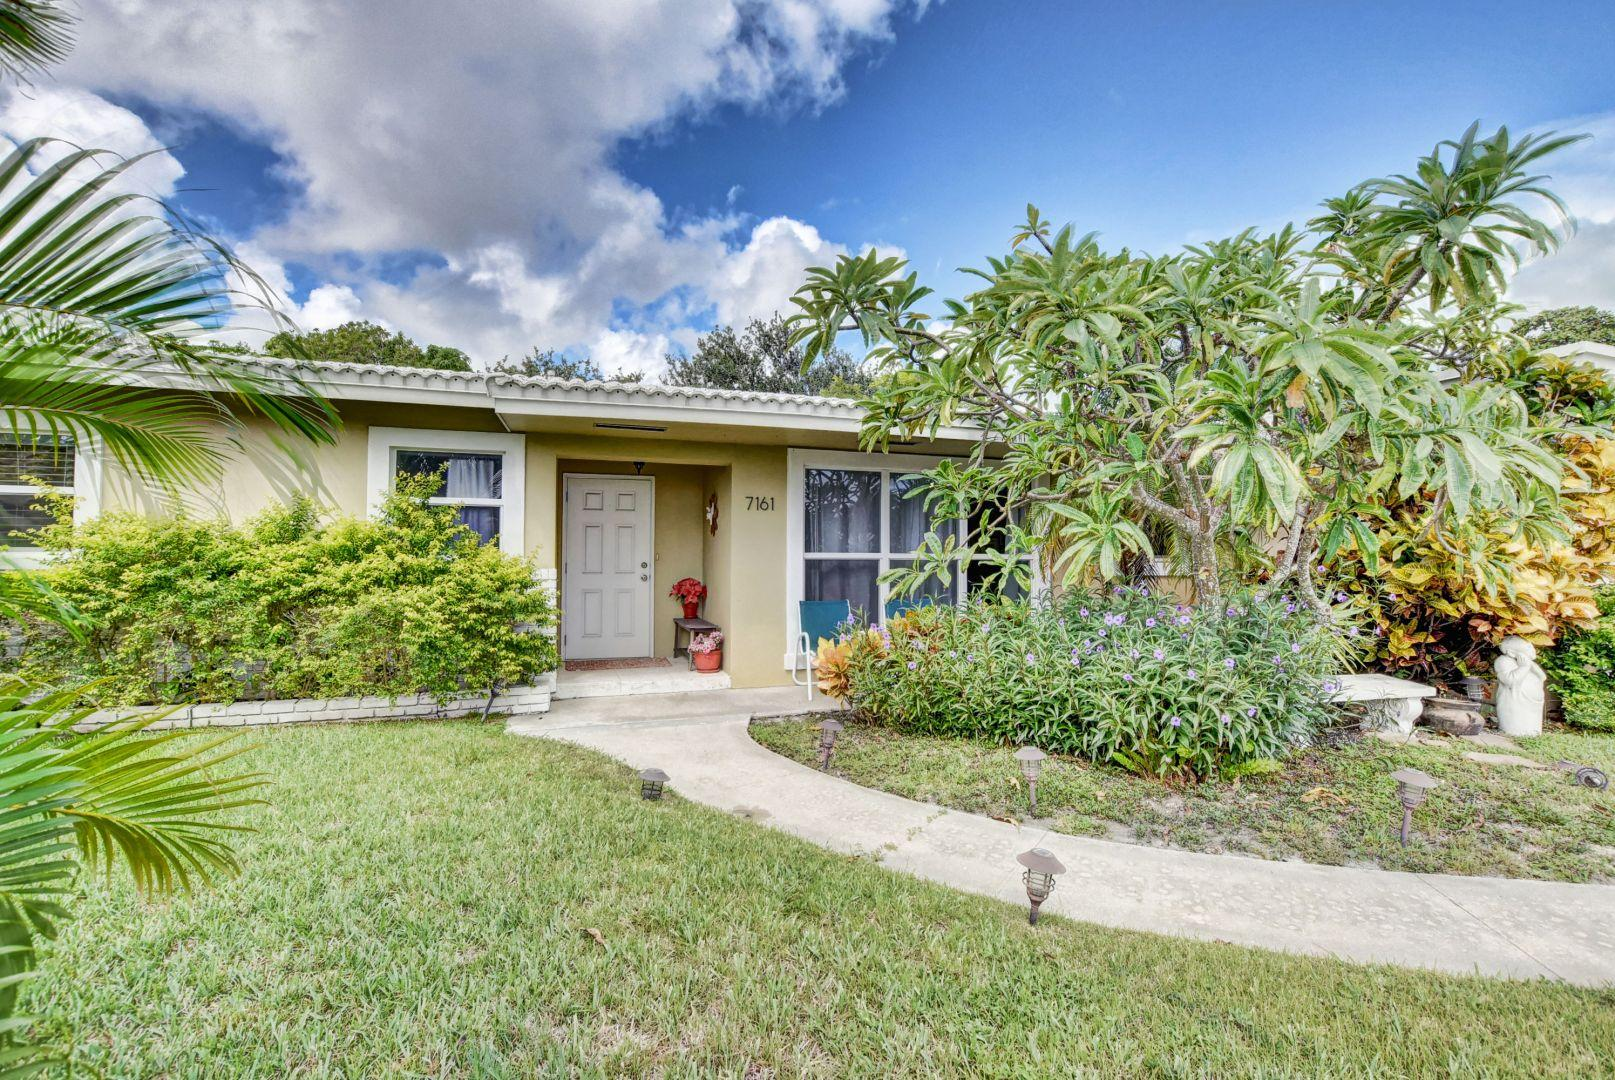 7161 7th Avenue, Boca Raton, Florida 33487, 3 Bedrooms Bedrooms, ,2 BathroomsBathrooms,Single Family,For Sale,7th,RX-10463203